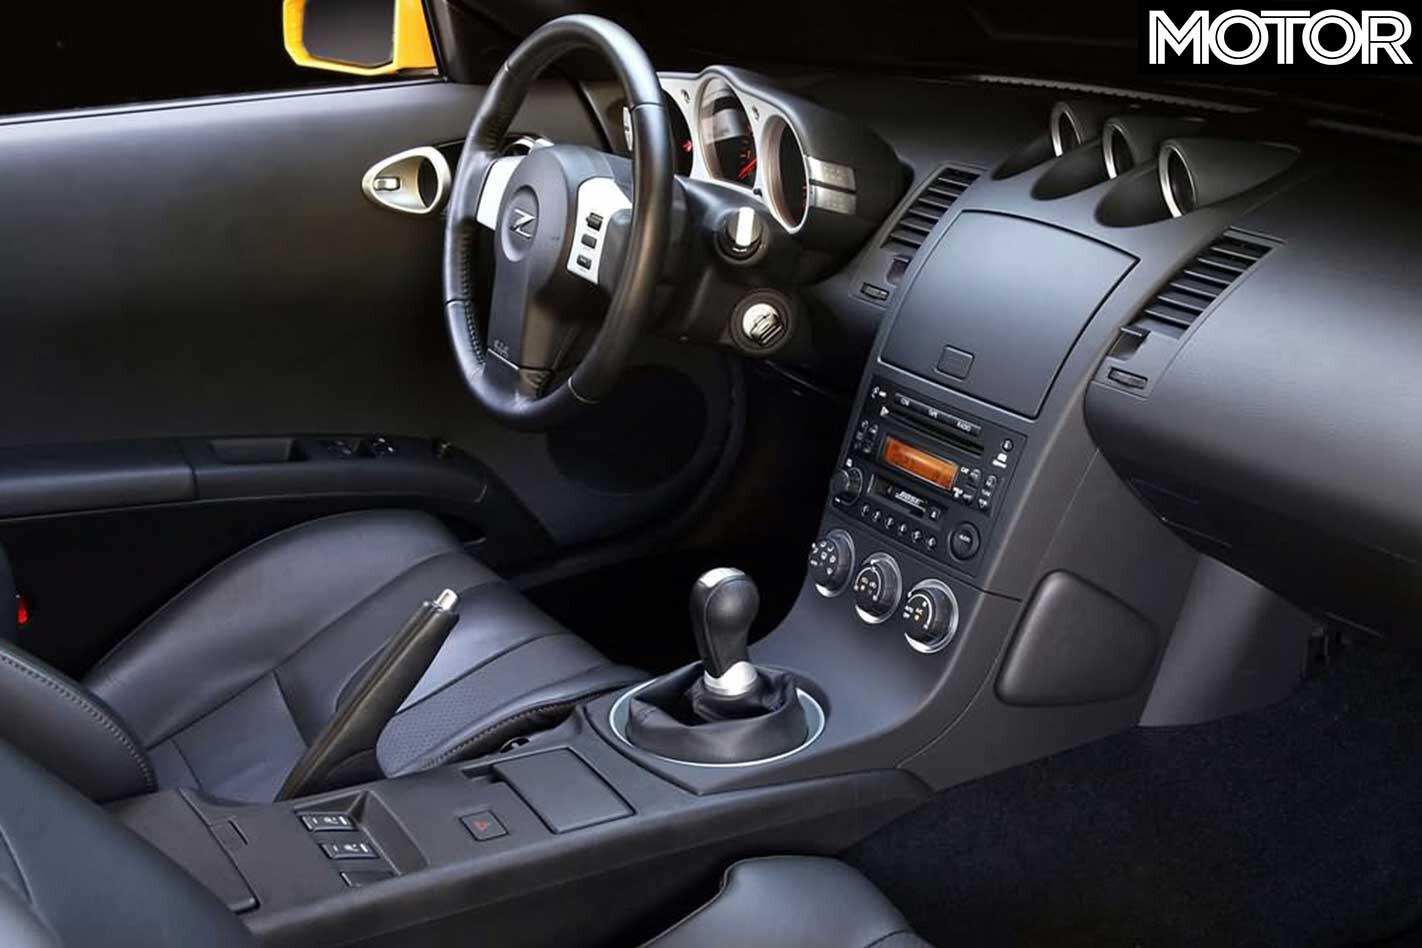 2005 Nissan 350 Z 35th Anniversary Interior Jpg